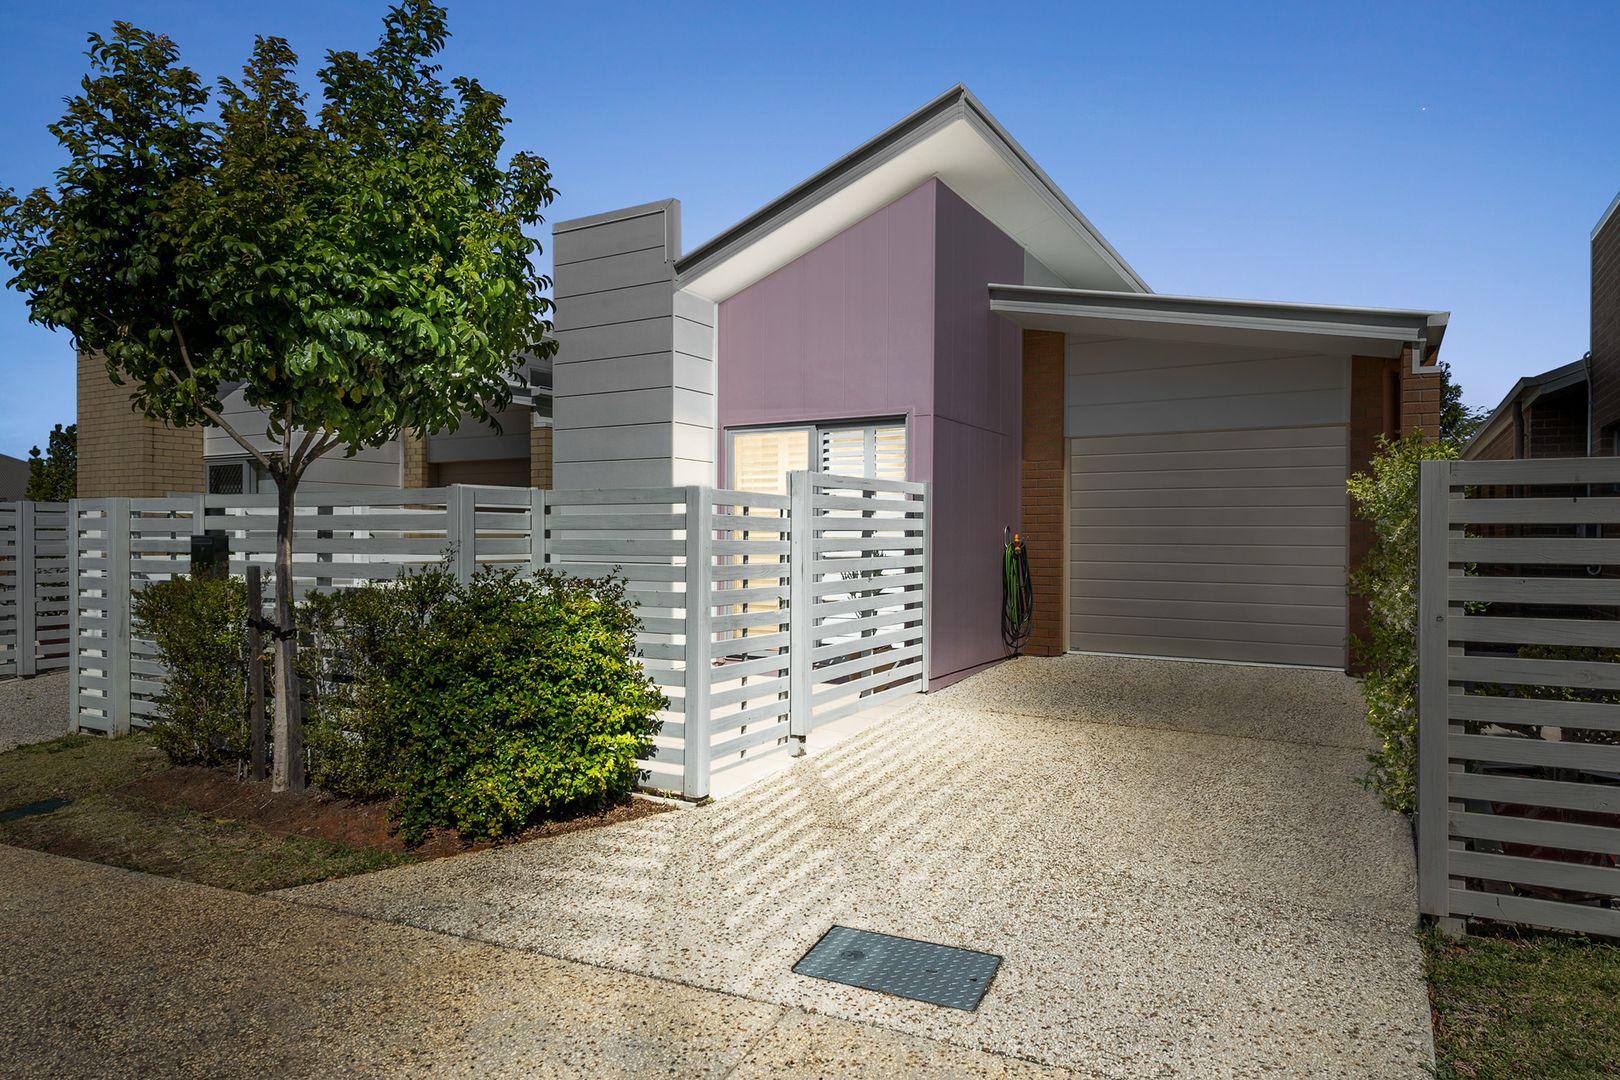 2/23 Essencia Avenue, Dakabin QLD 4503, Image 0